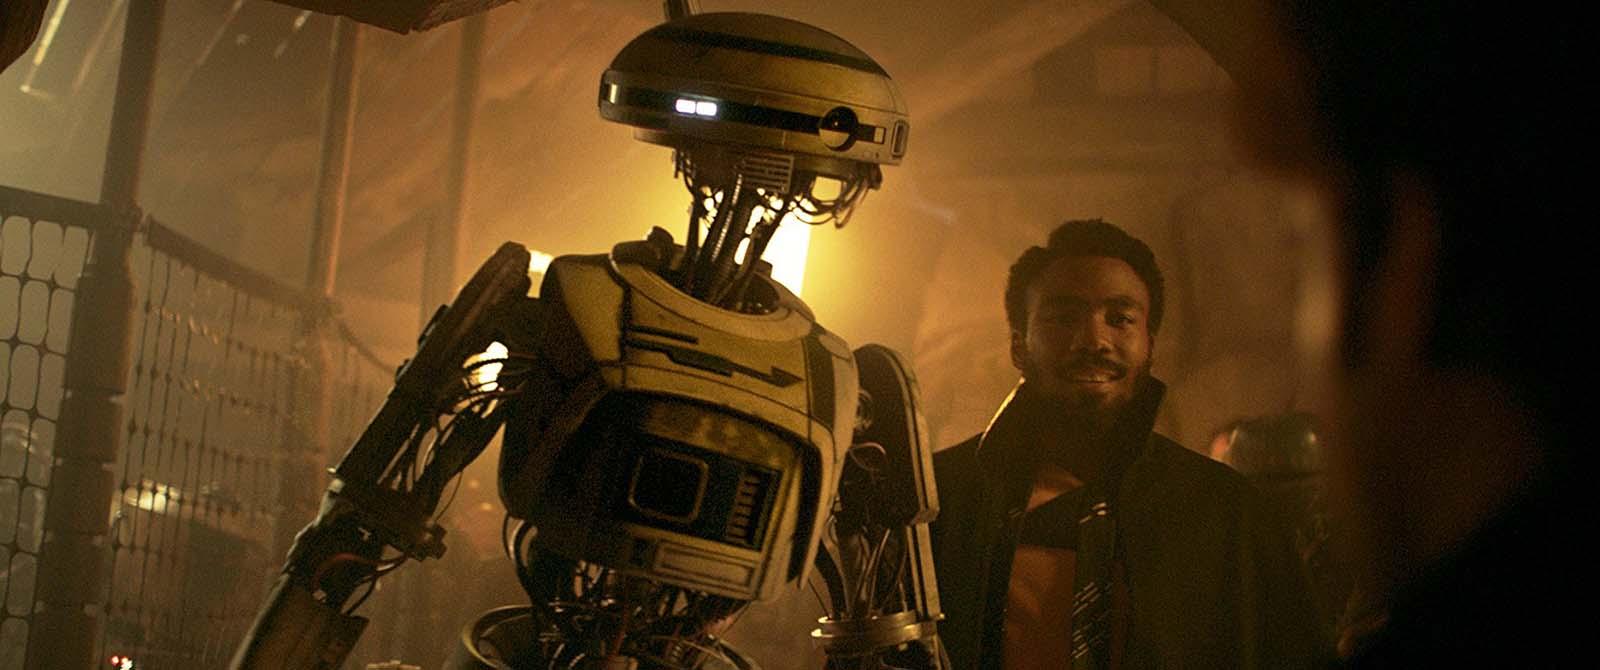 Solo, un Star Wars Story, image du film © Disney